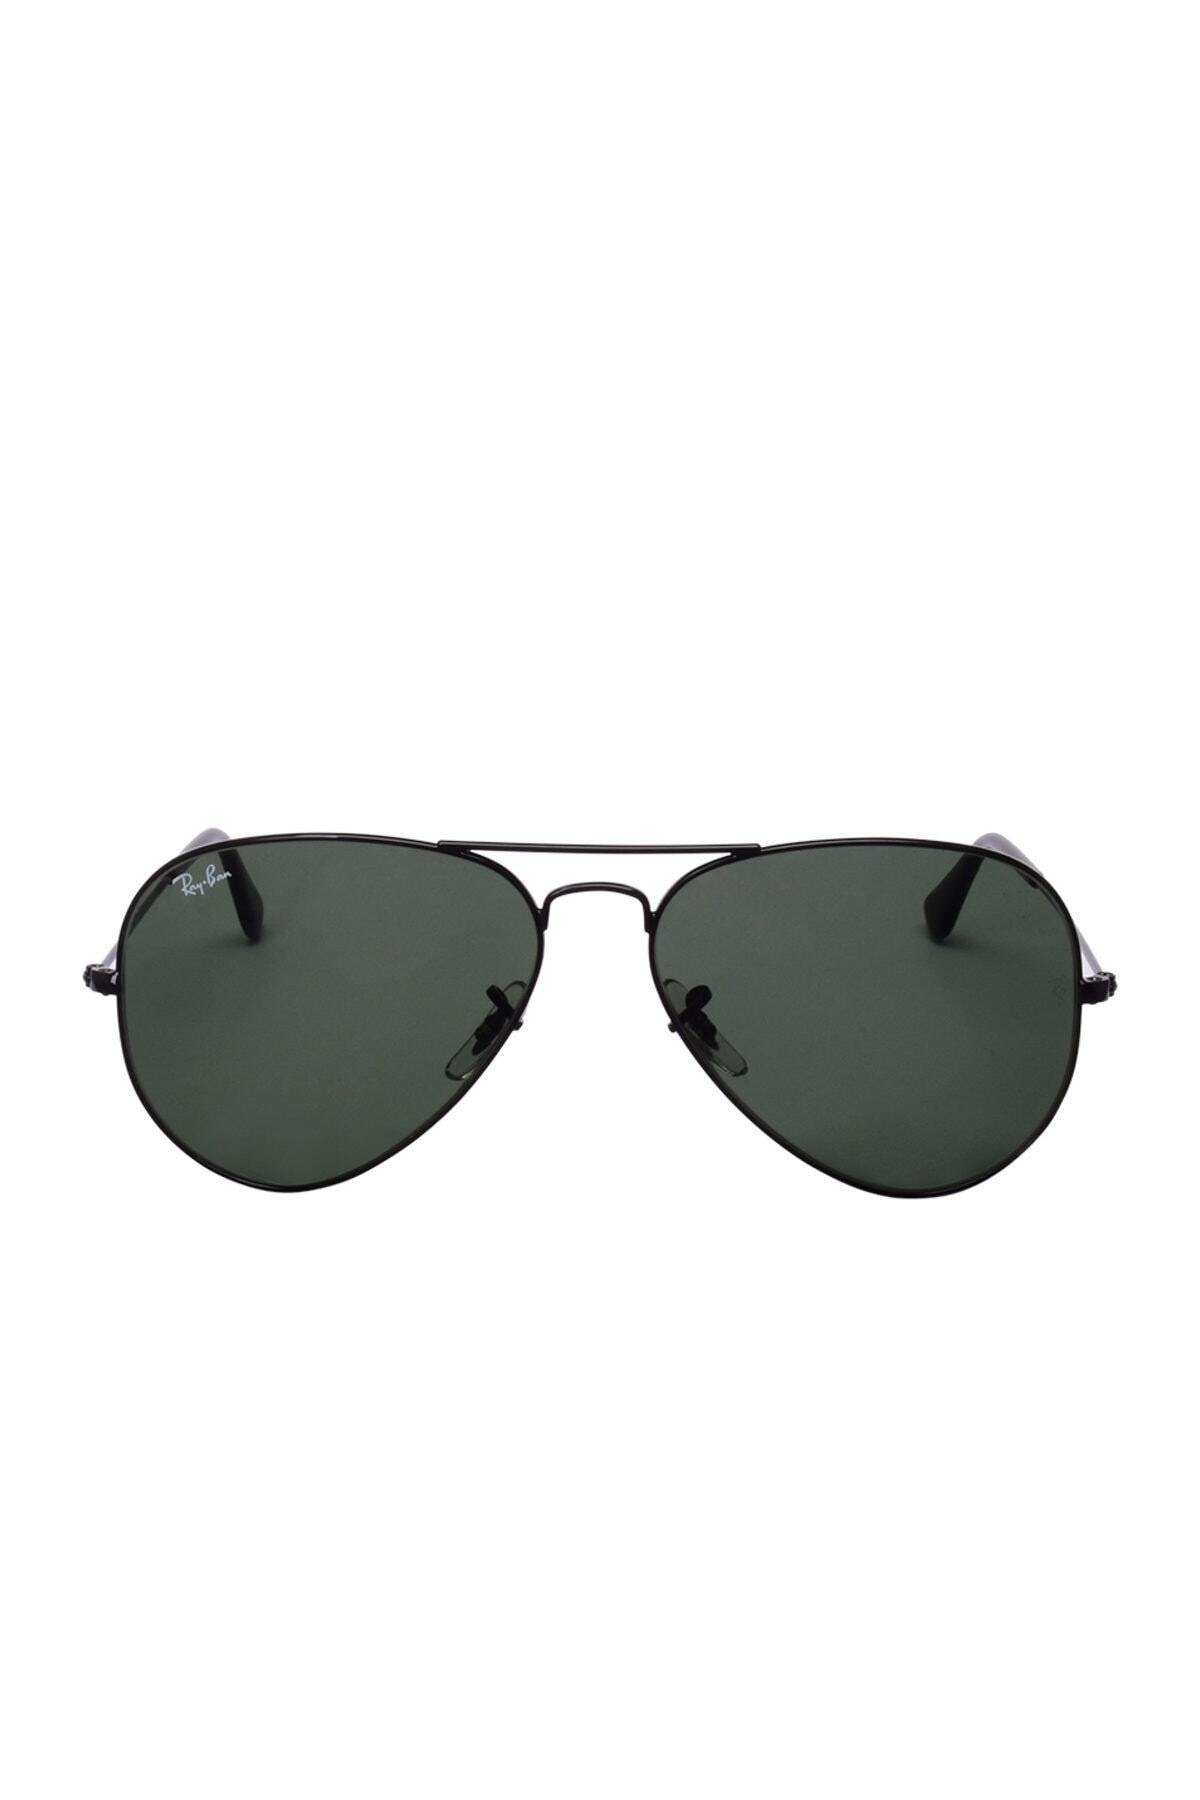 Original Rayban Women's 2021 New Season Sunglasses